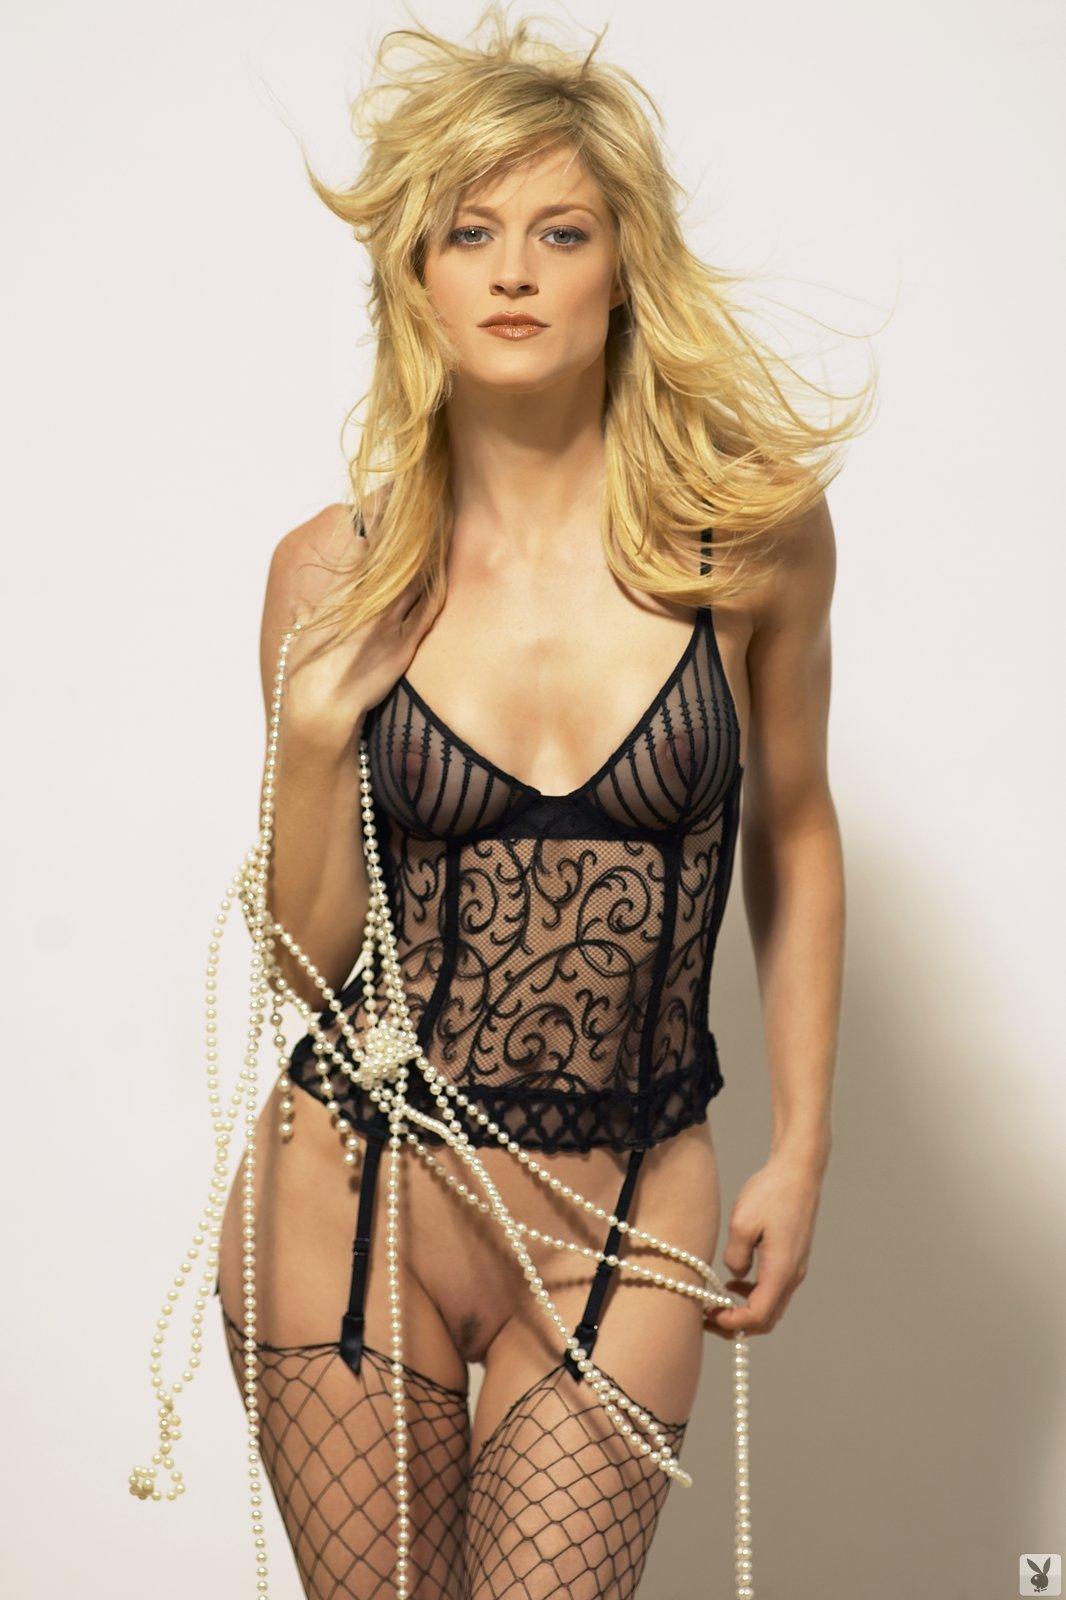 Teri Polo Nude On Playboy Plus! (20)